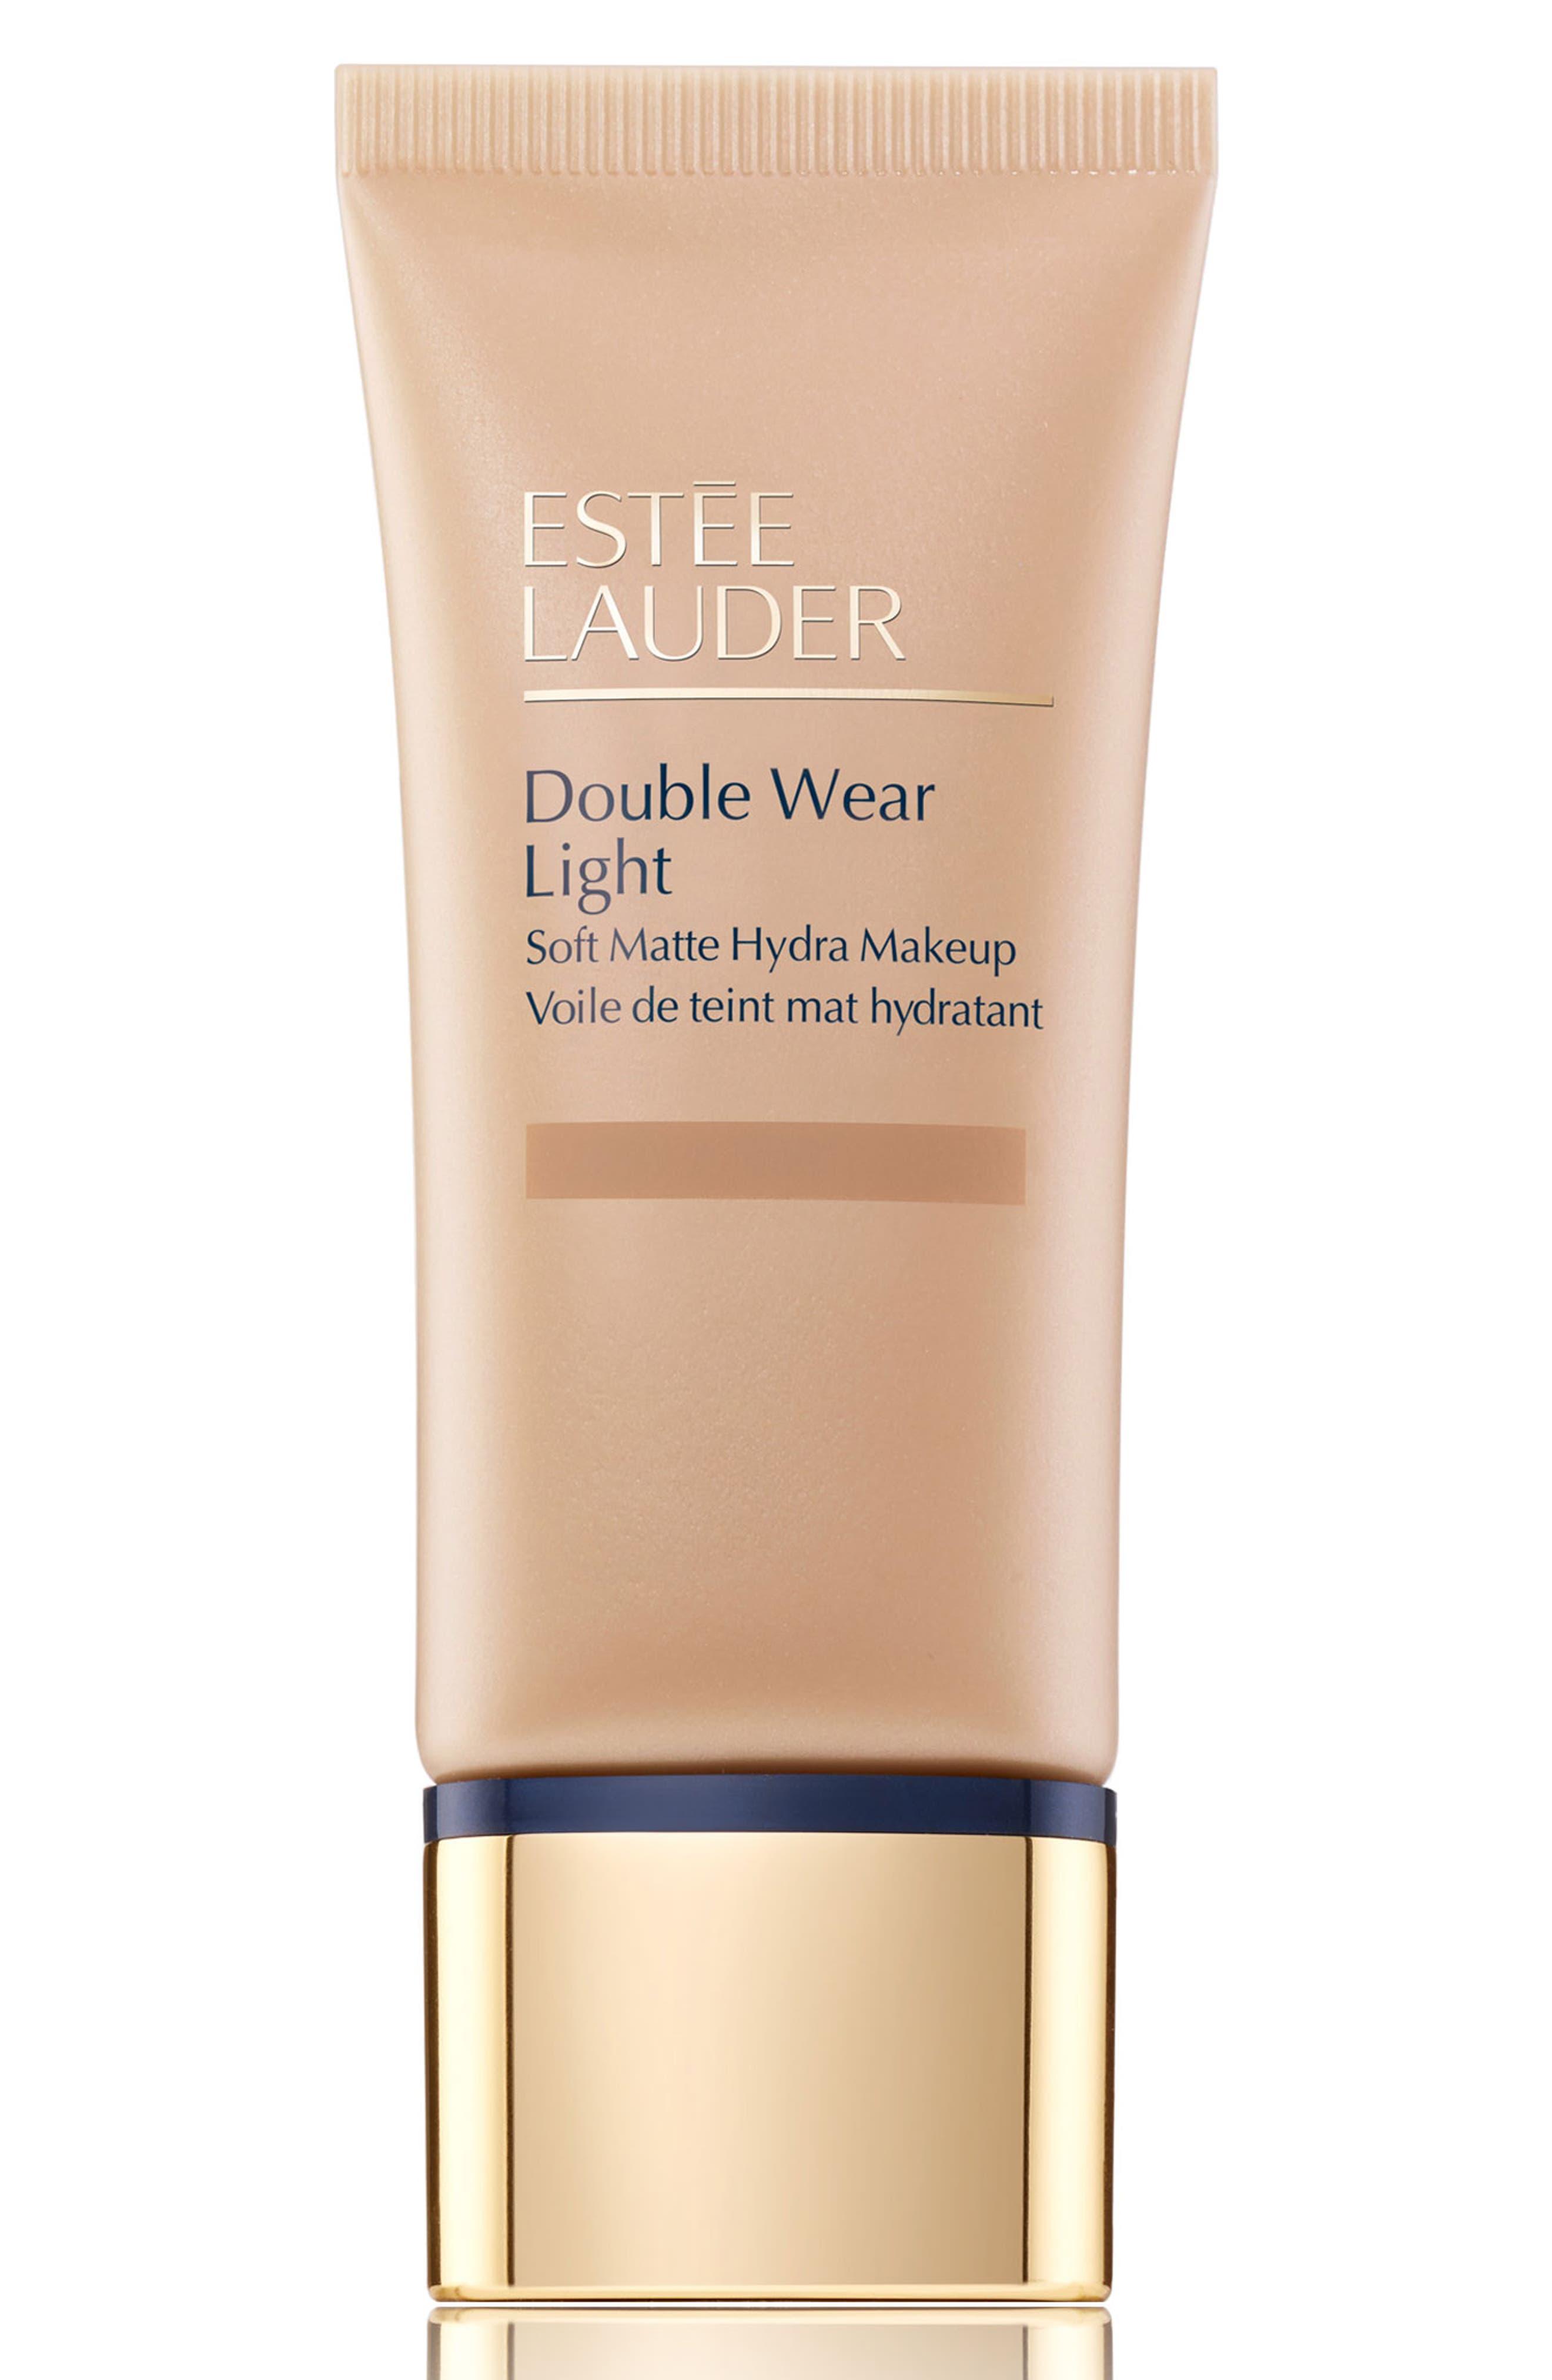 Estee Lauder Double Wear Light Soft Matte Hydra Makeup - 3N1 Ivory Beige